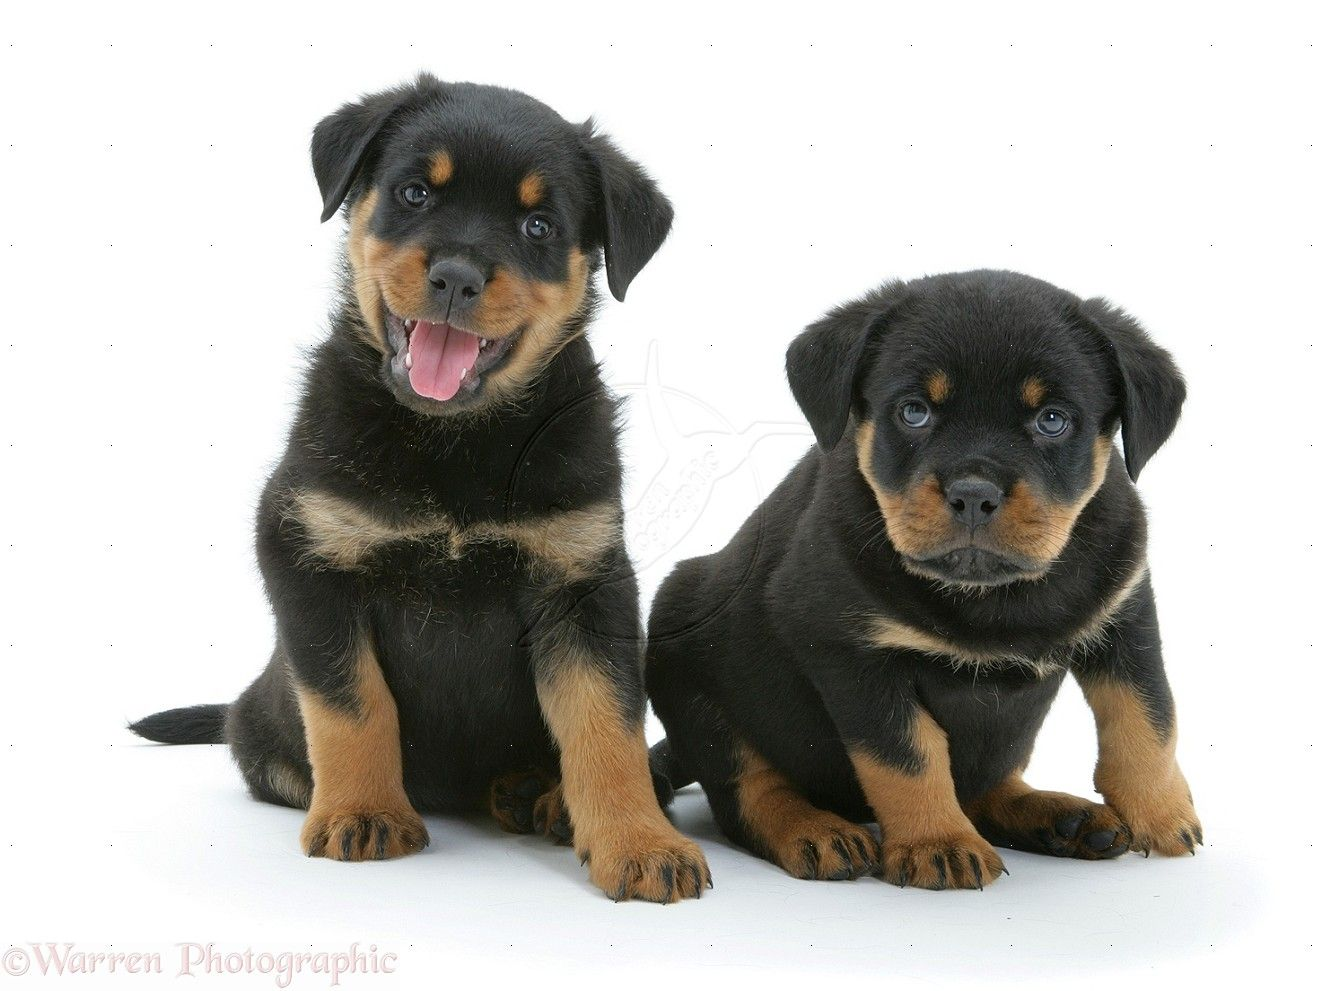 Two Rottweiler Pups Rottweiler Puppies Rottweiler German Rottweiler Puppies